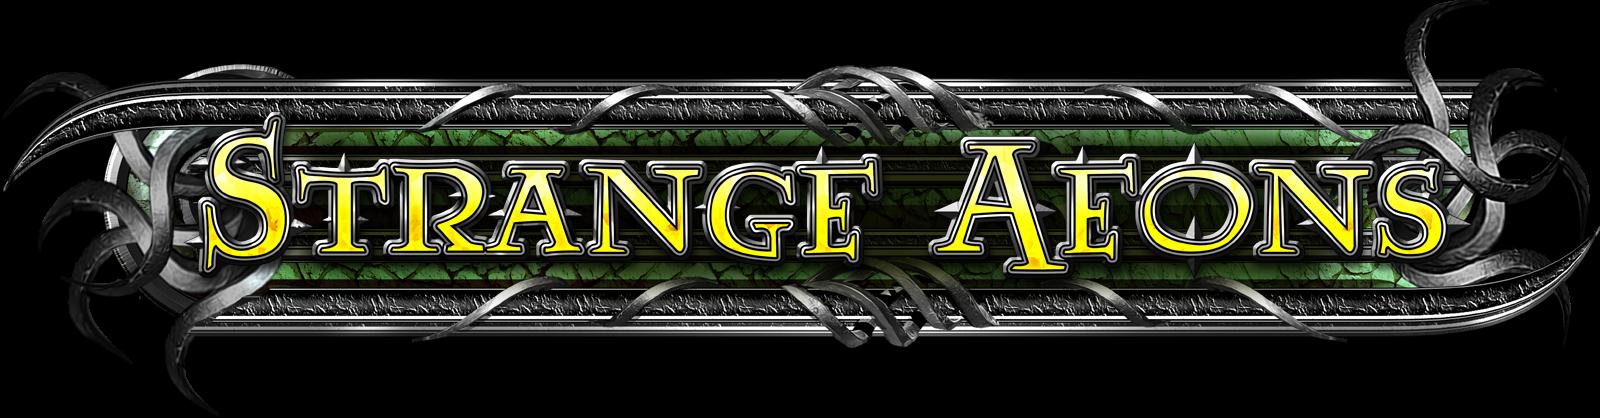 19 strange aeons2